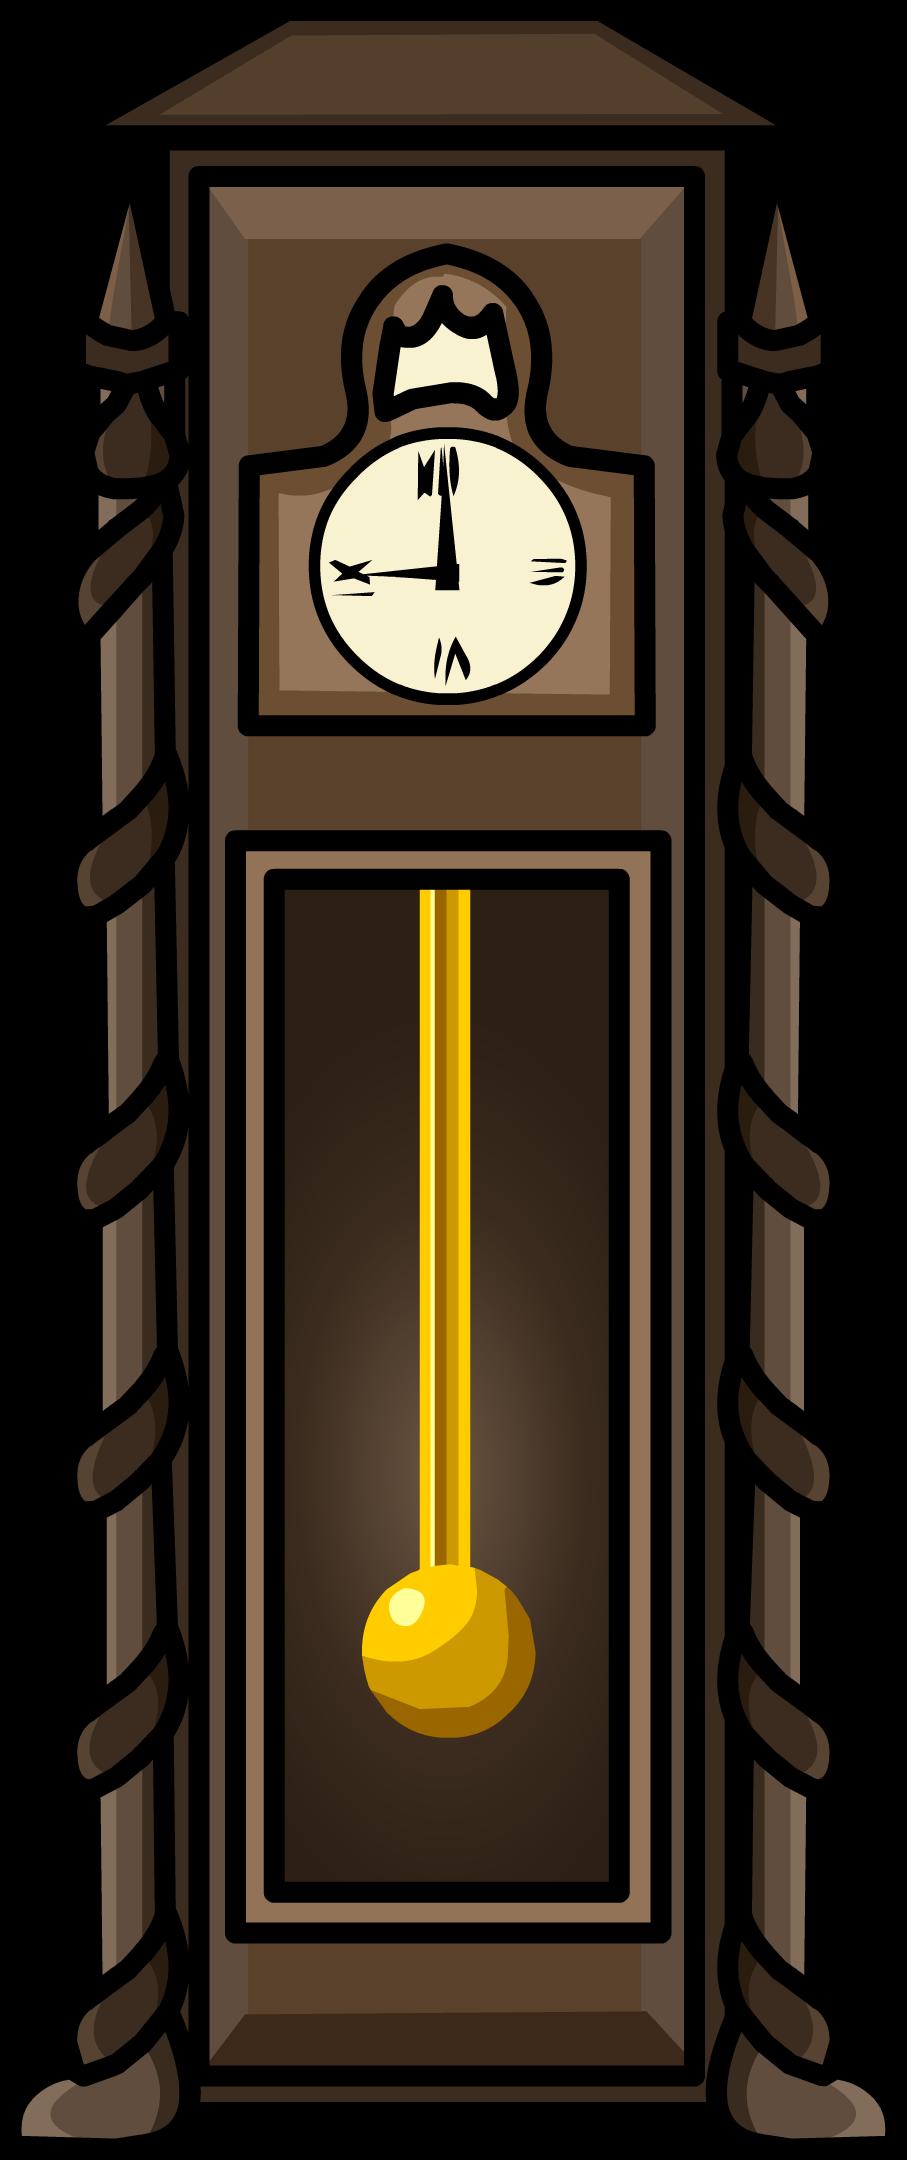 Antique Clock Furniture Icon - Club Penguin Clock (907x2160), Png Download